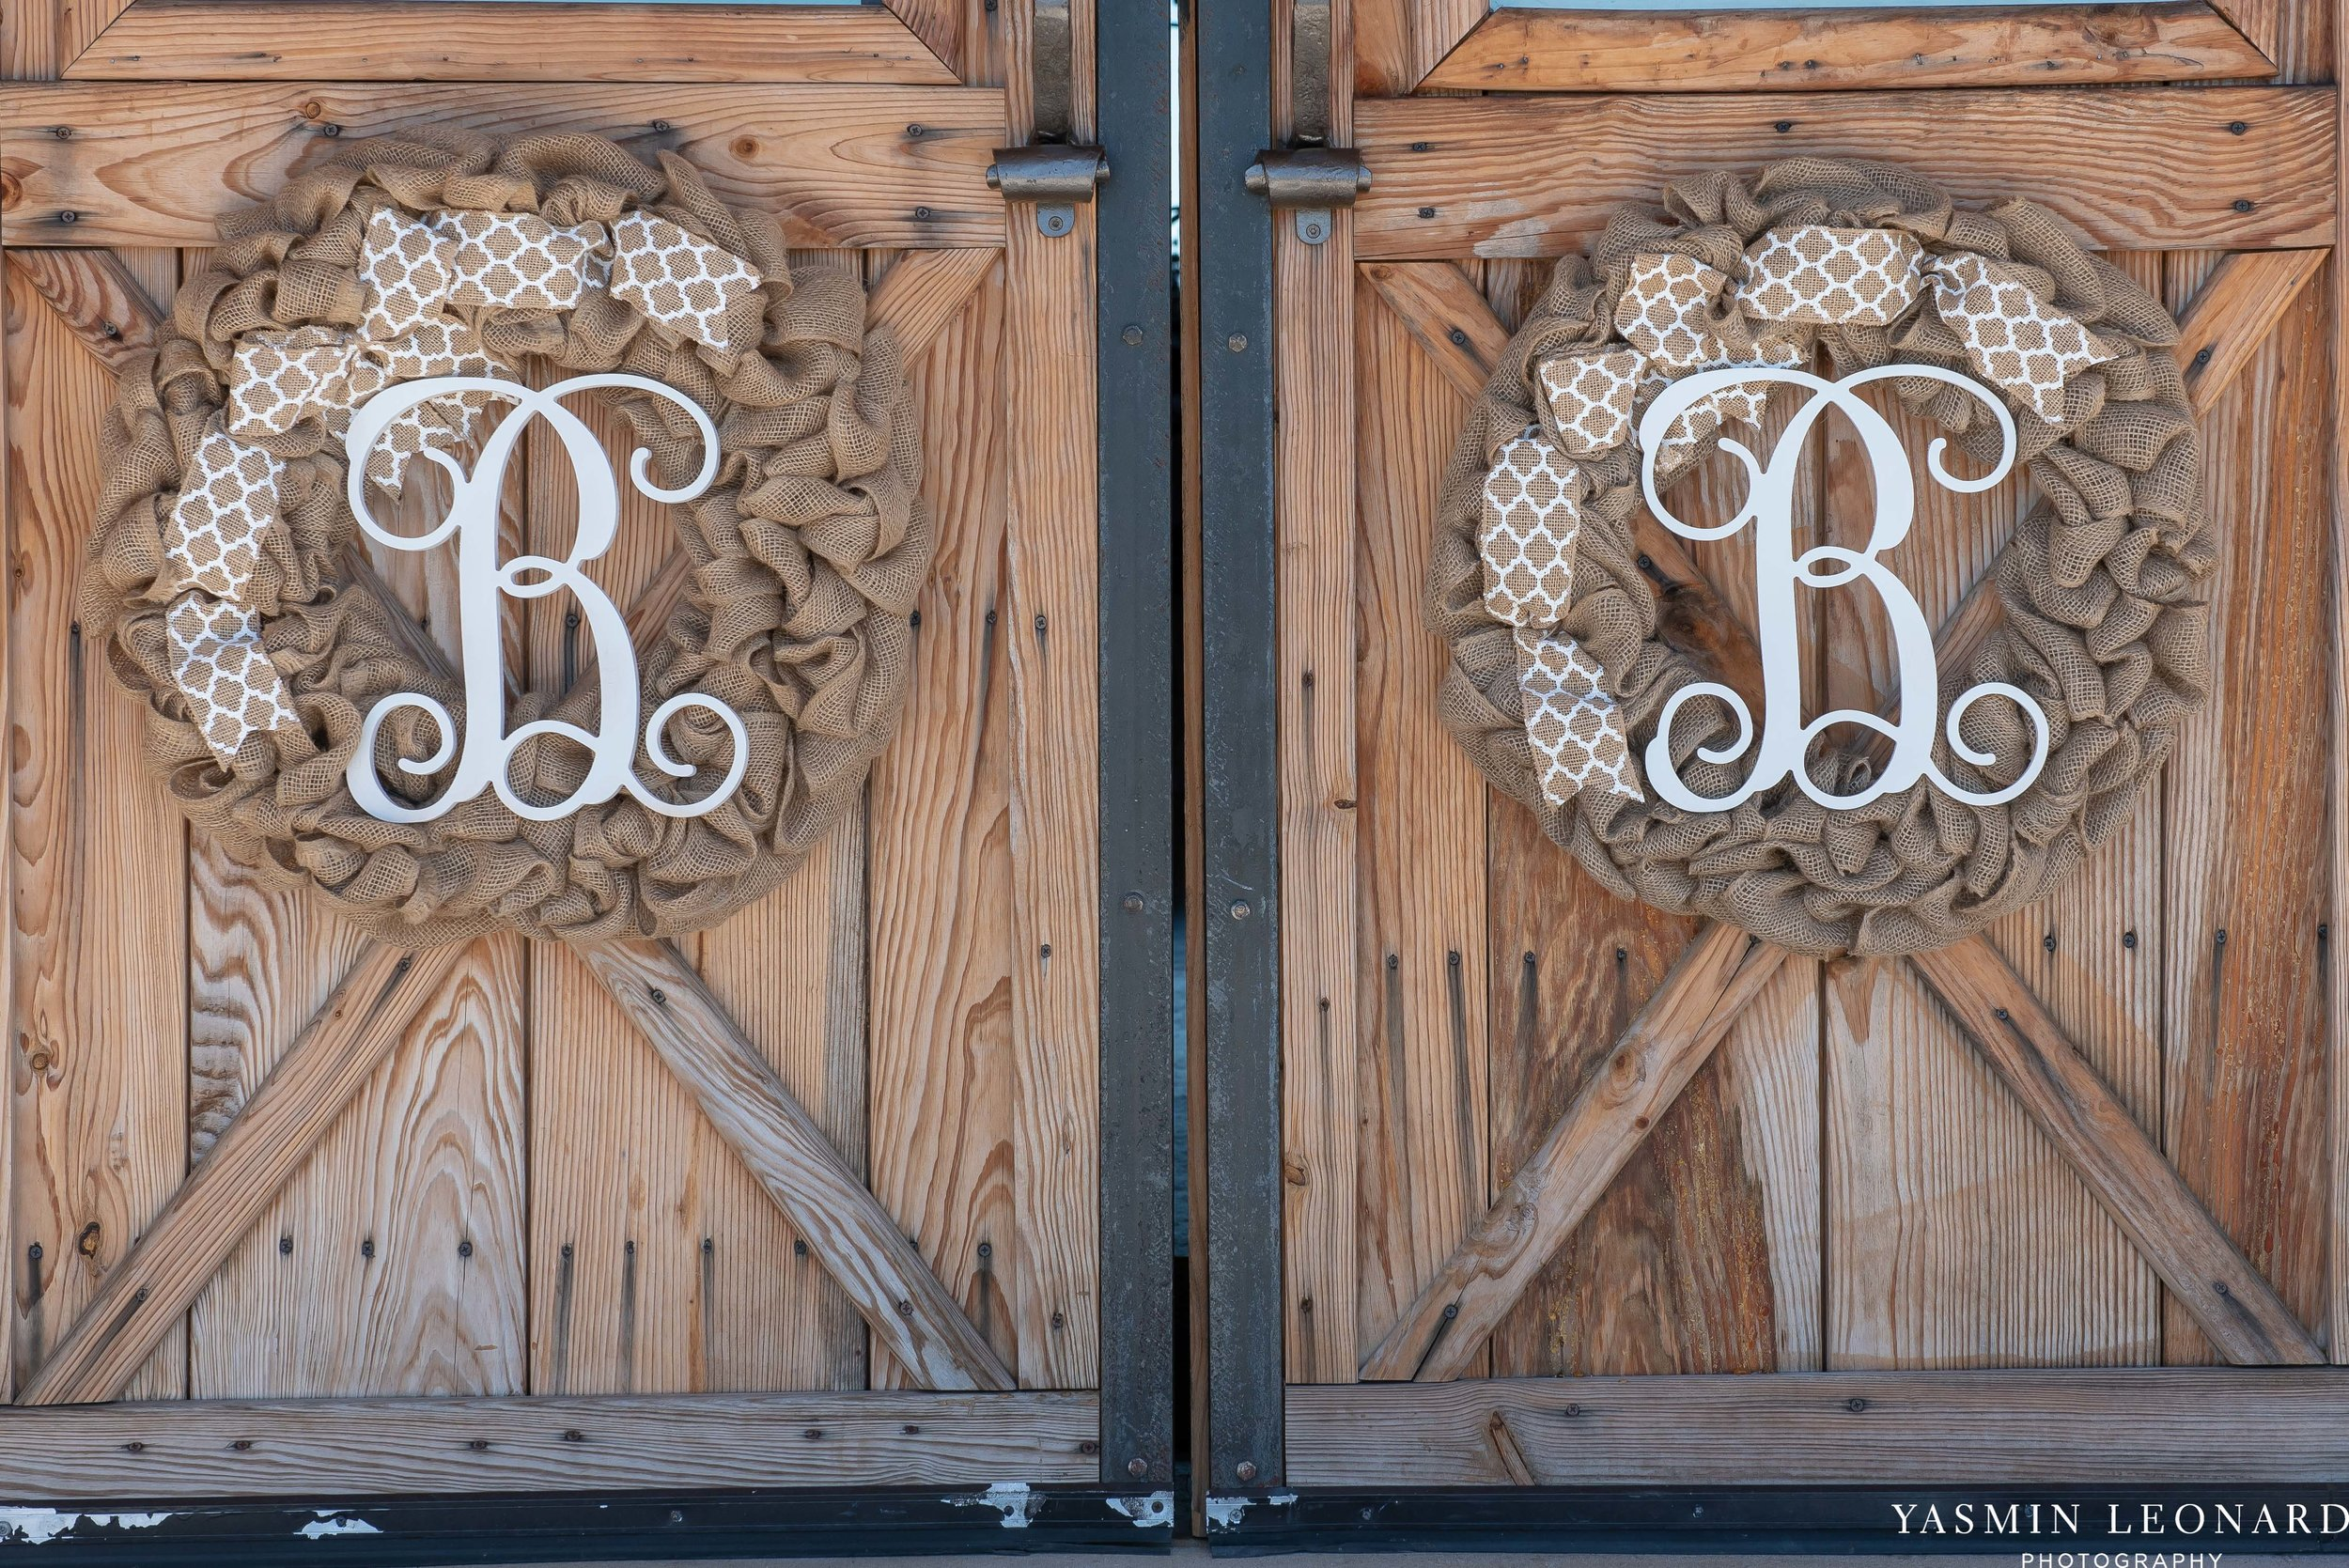 The Barn at Heritage Farm - Country Wedding - Pink and Blue Wedding - Barn Wedding - Outdoor Wedding - Cotton and Wheat Decor - Groom in Bibs - Pink Bridal Colors - Yasmin Leonard Photography-7.jpg